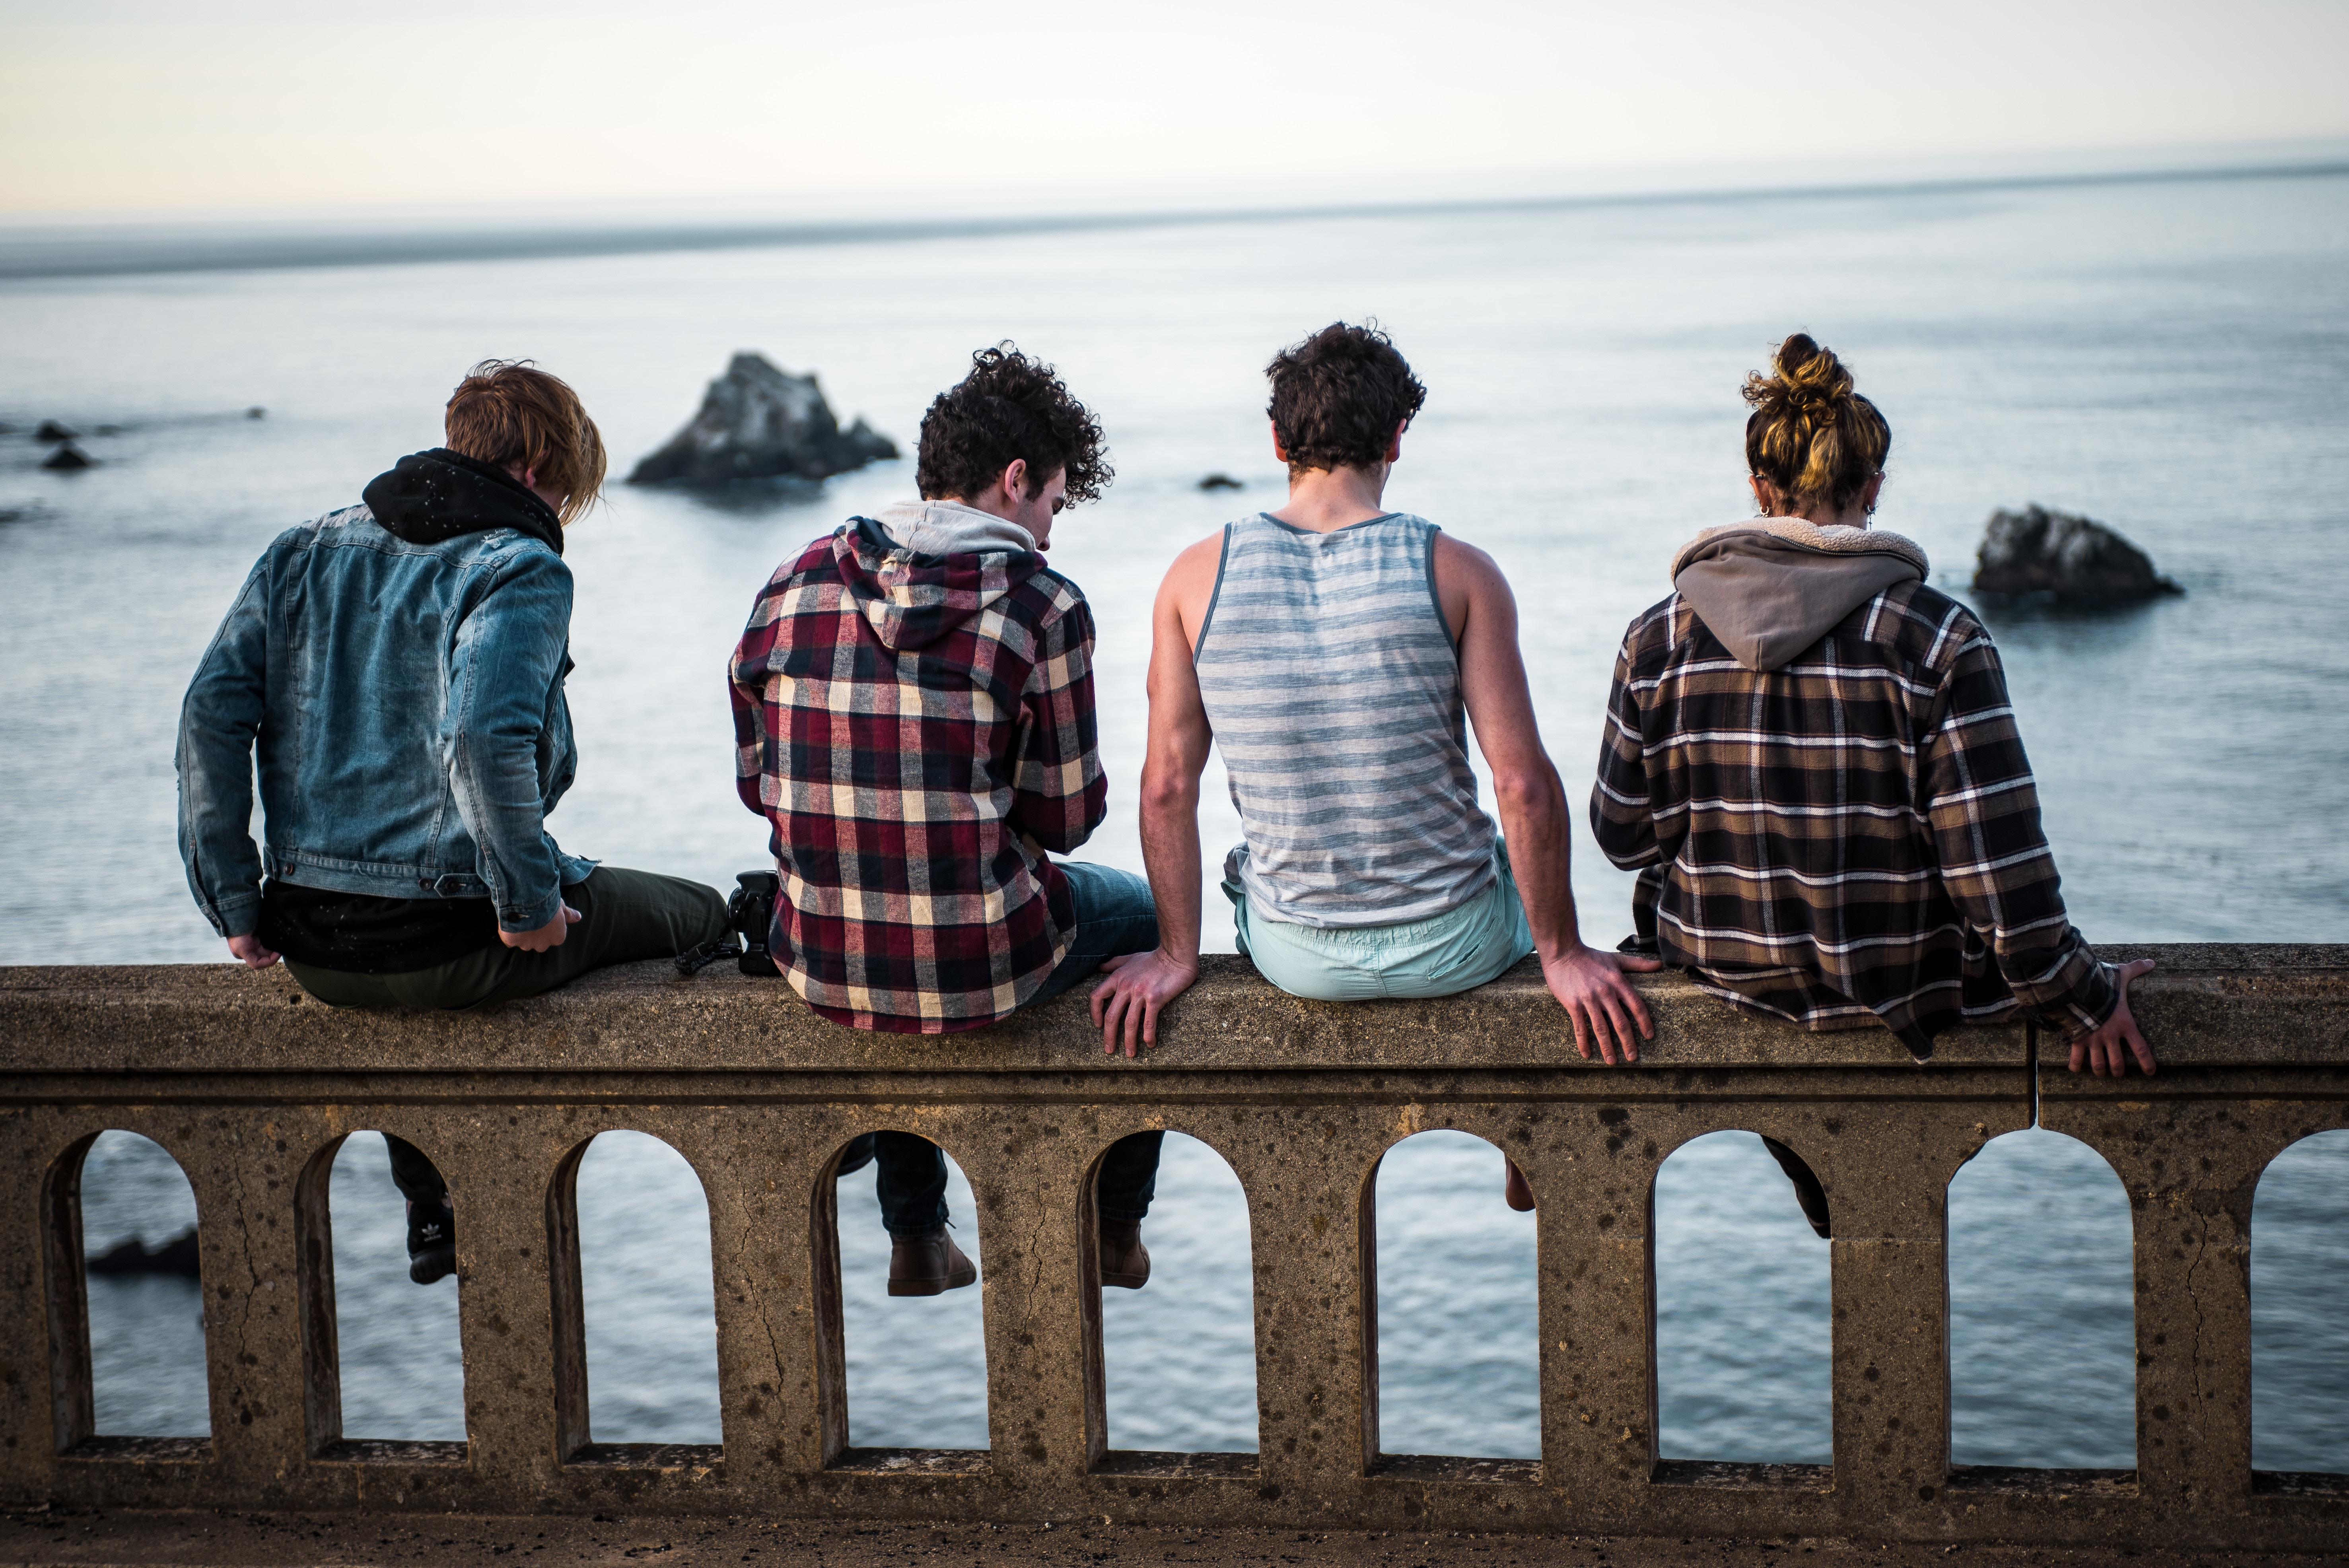 Keys for Kids prepares new teen devotional